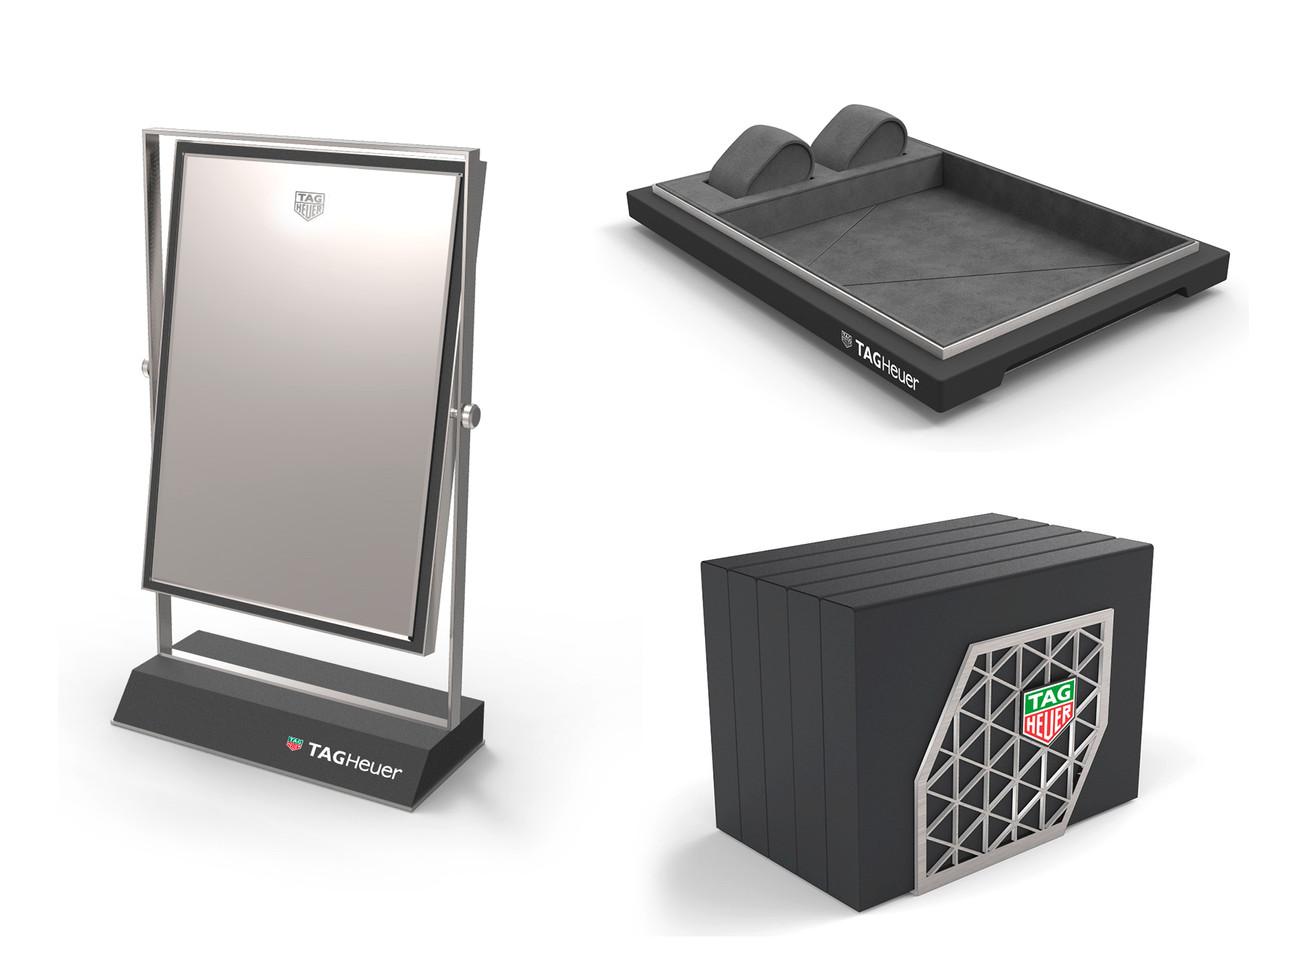 Retail Accessories - Mirror, Presentation tray, Catalog holder